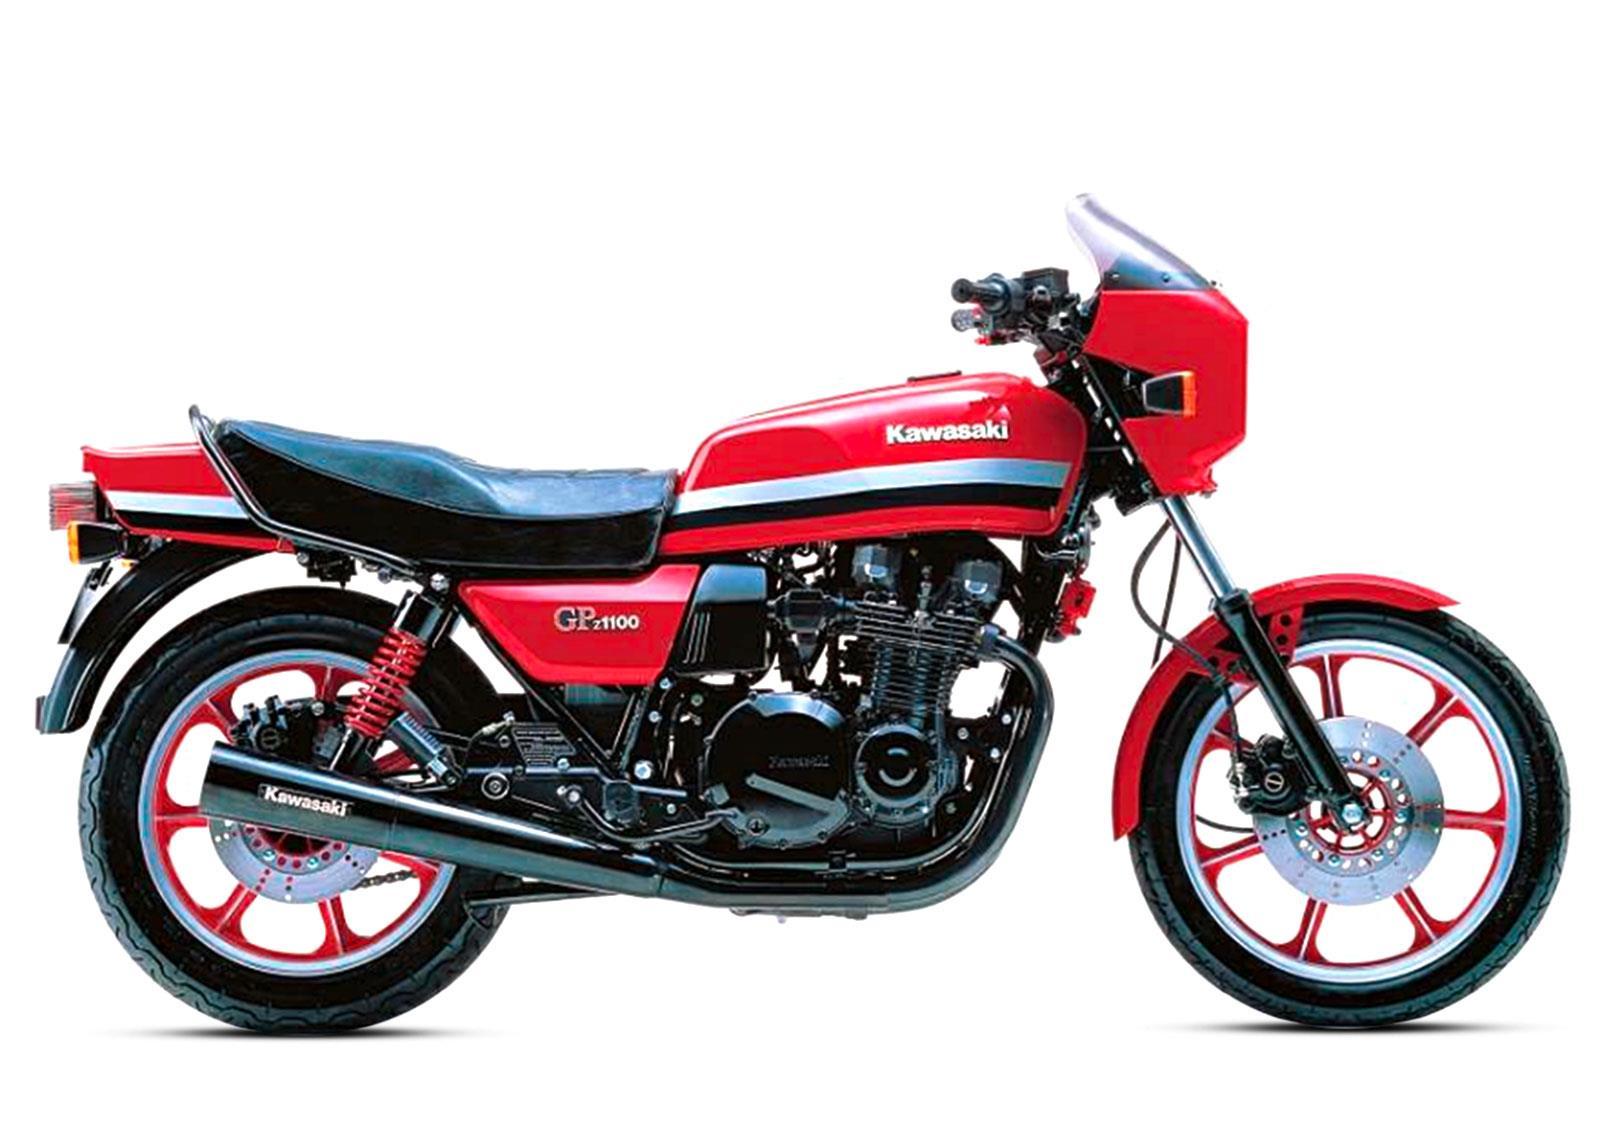 Kawasaki Gpz1100  The Last King Of A Vanished Clan